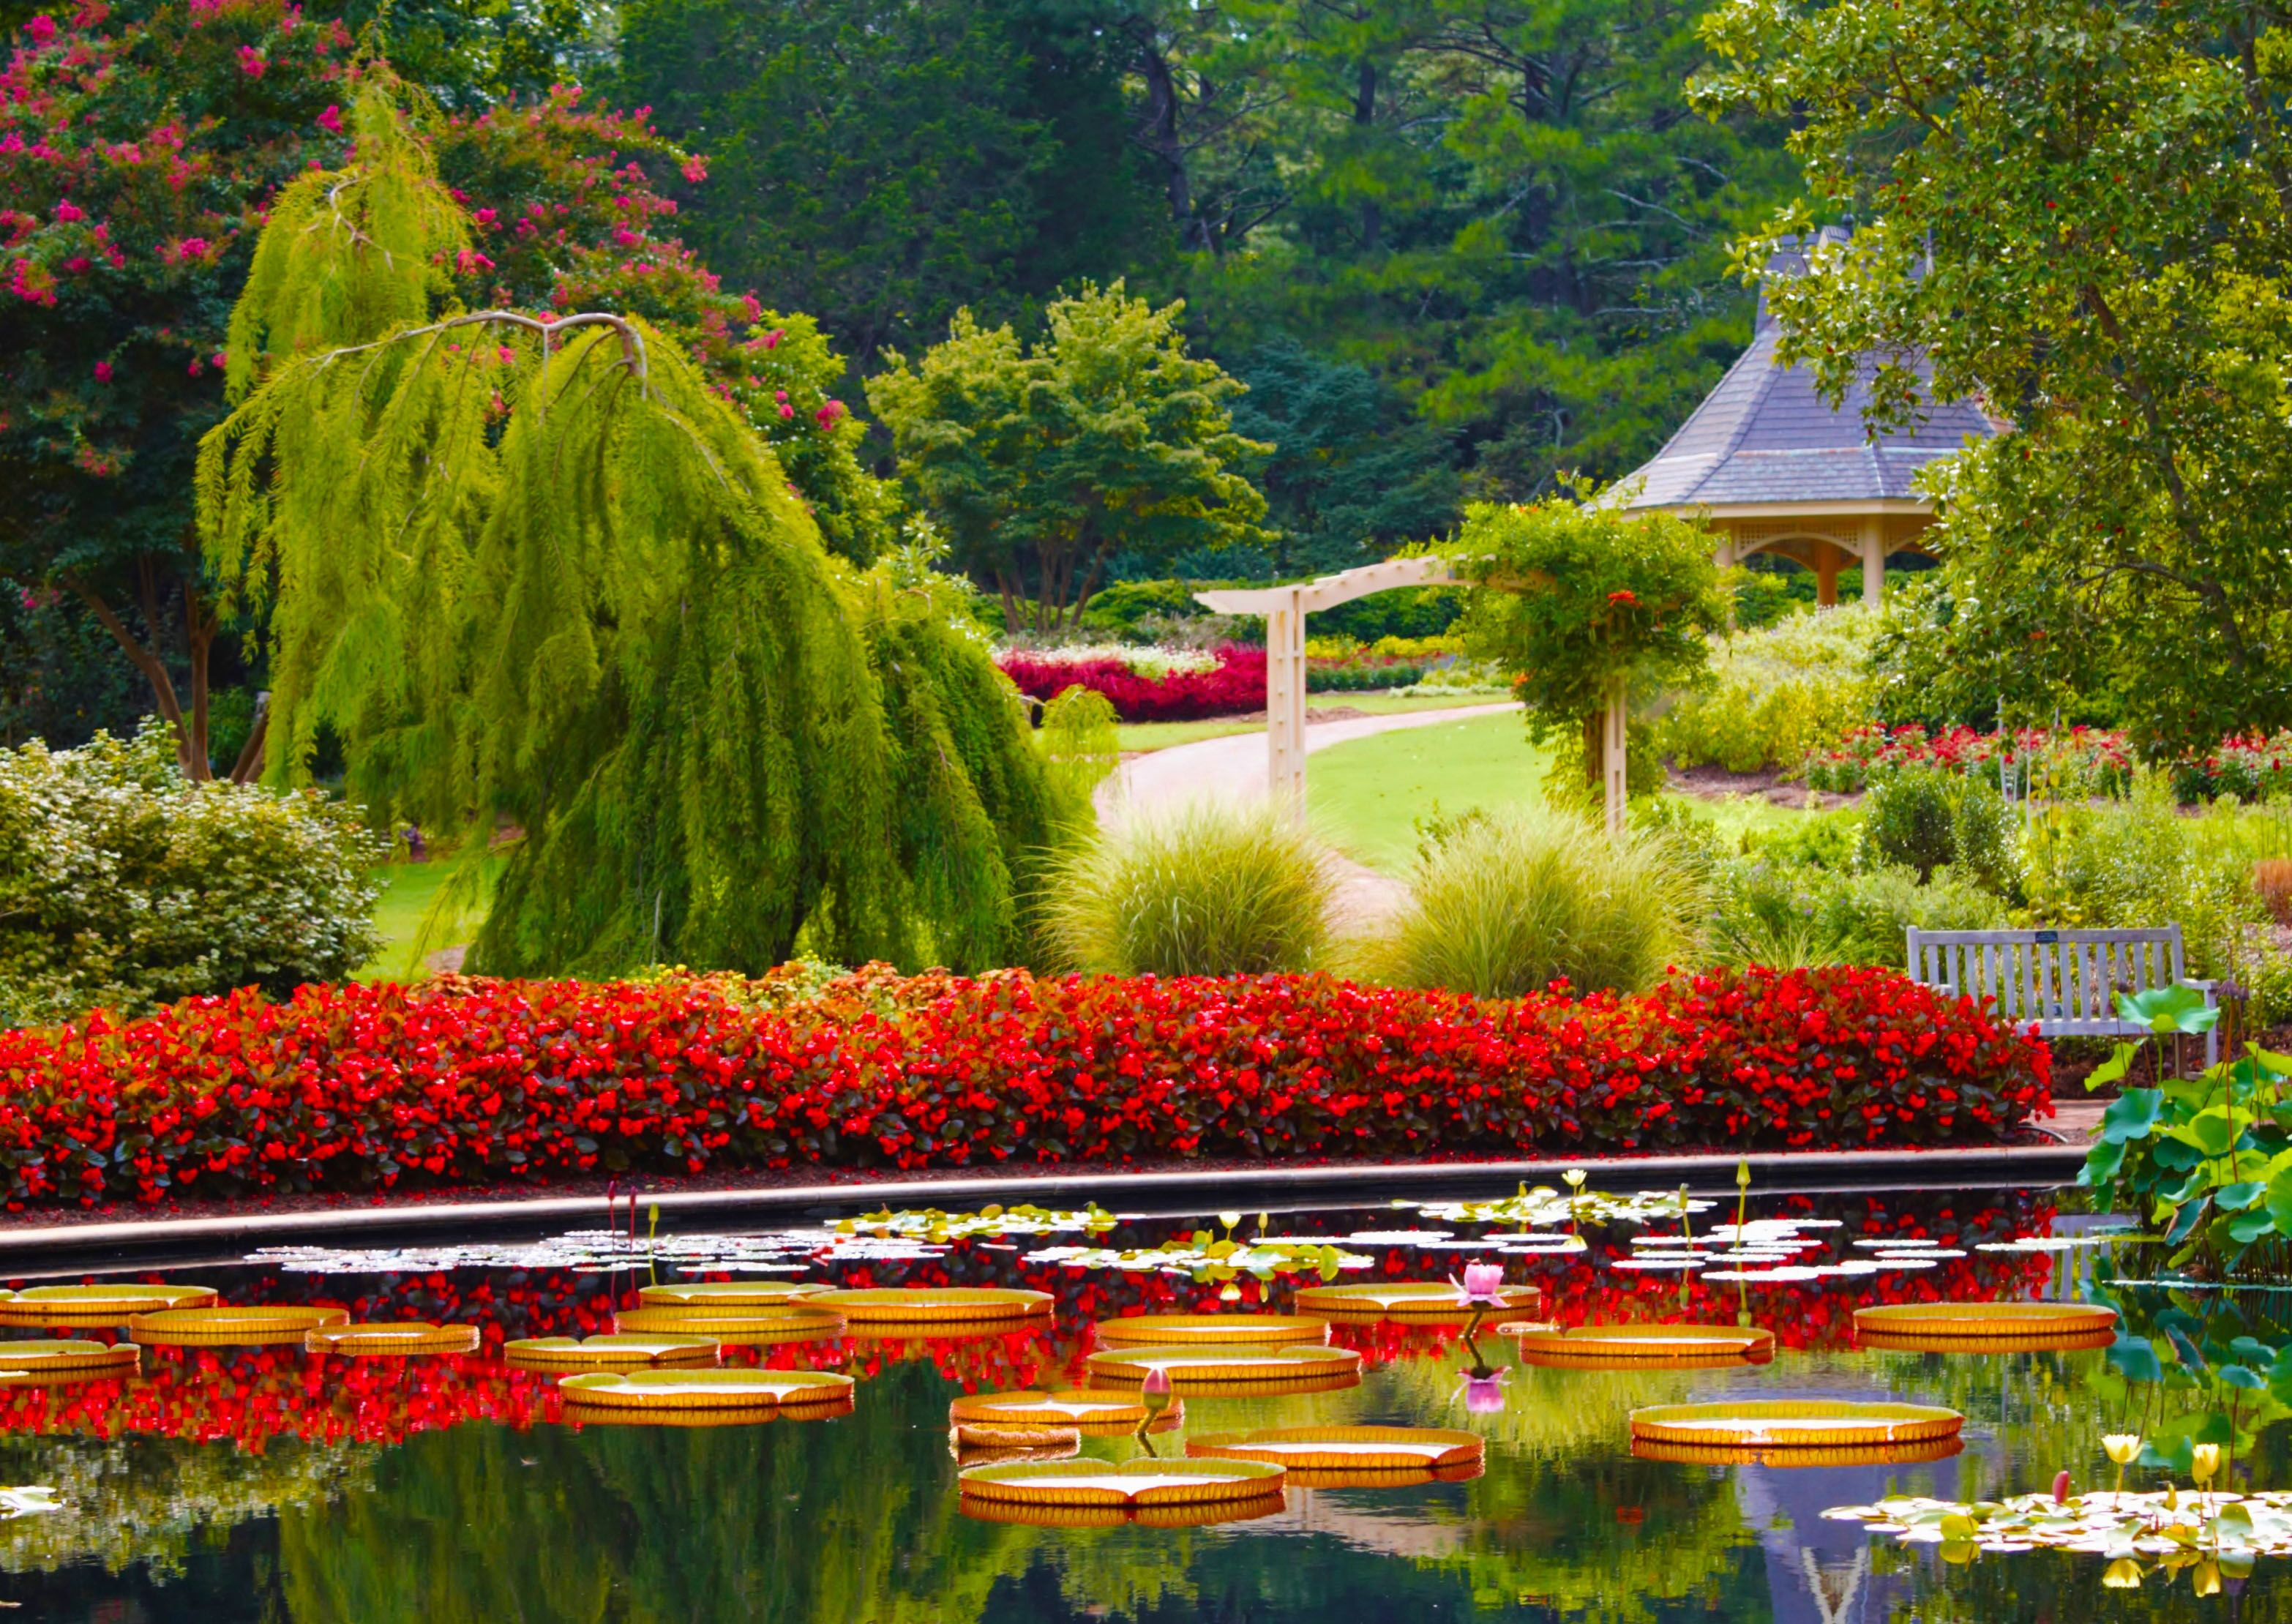 69aea59f9384a40ffc32664b24fd8f84 - Botanical Gardens Mother's Day Brunch 2019